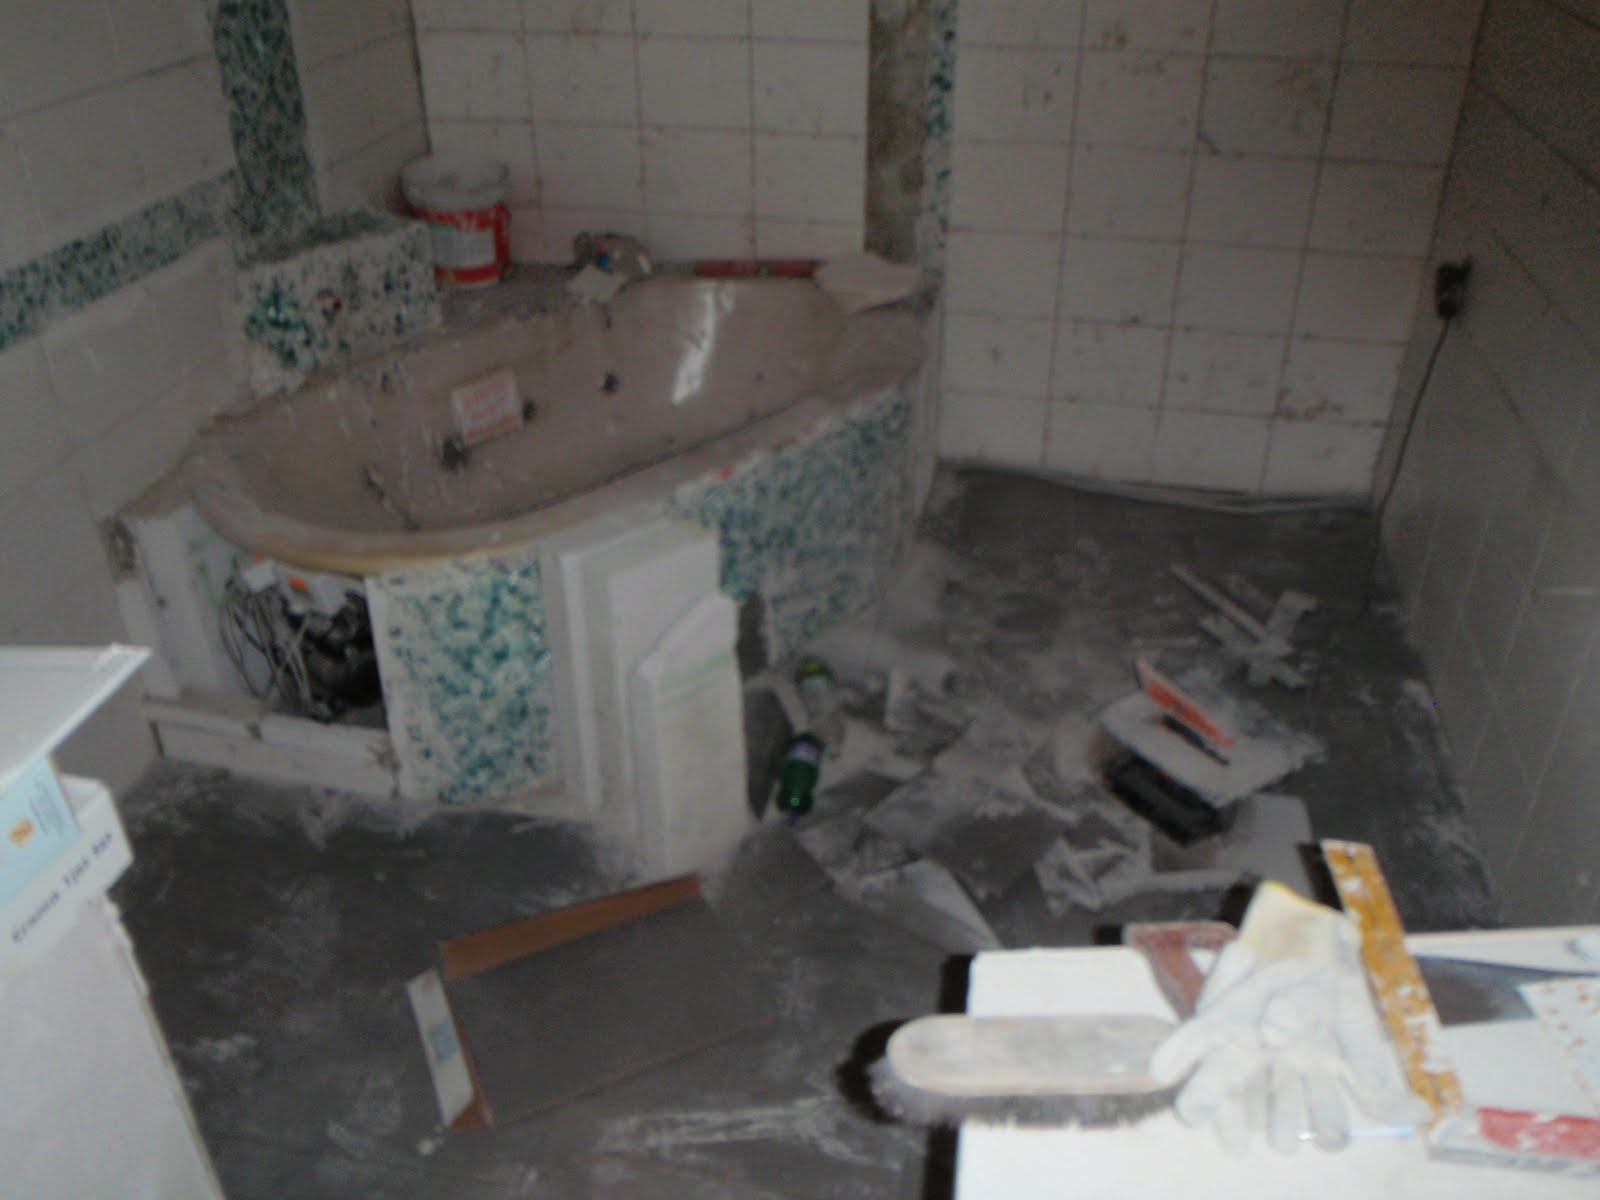 Wellnessraum keller  Zieglers bauen Haus: Mai 2011